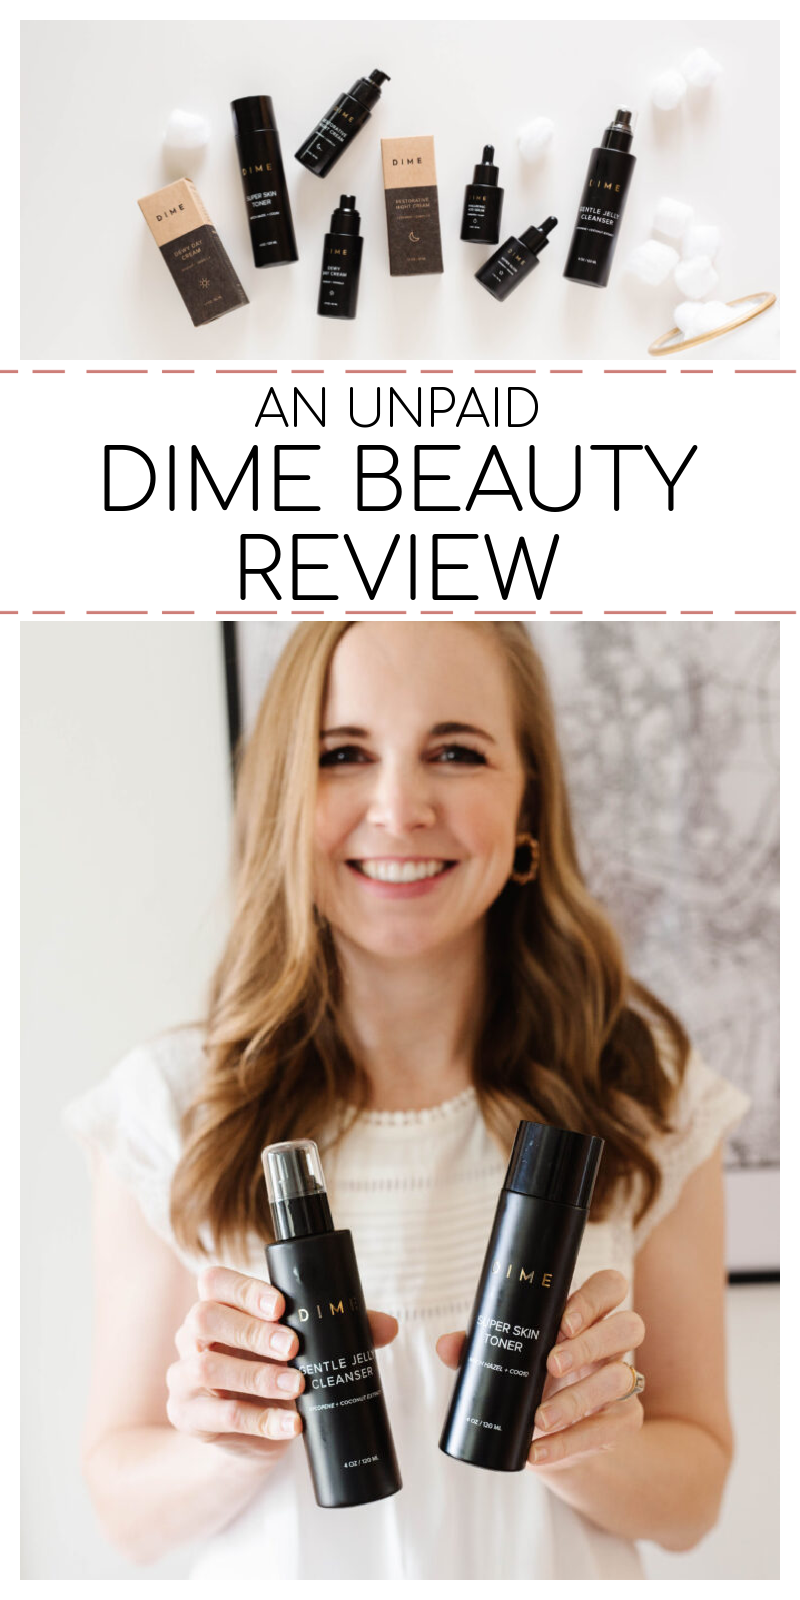 dime beauty review